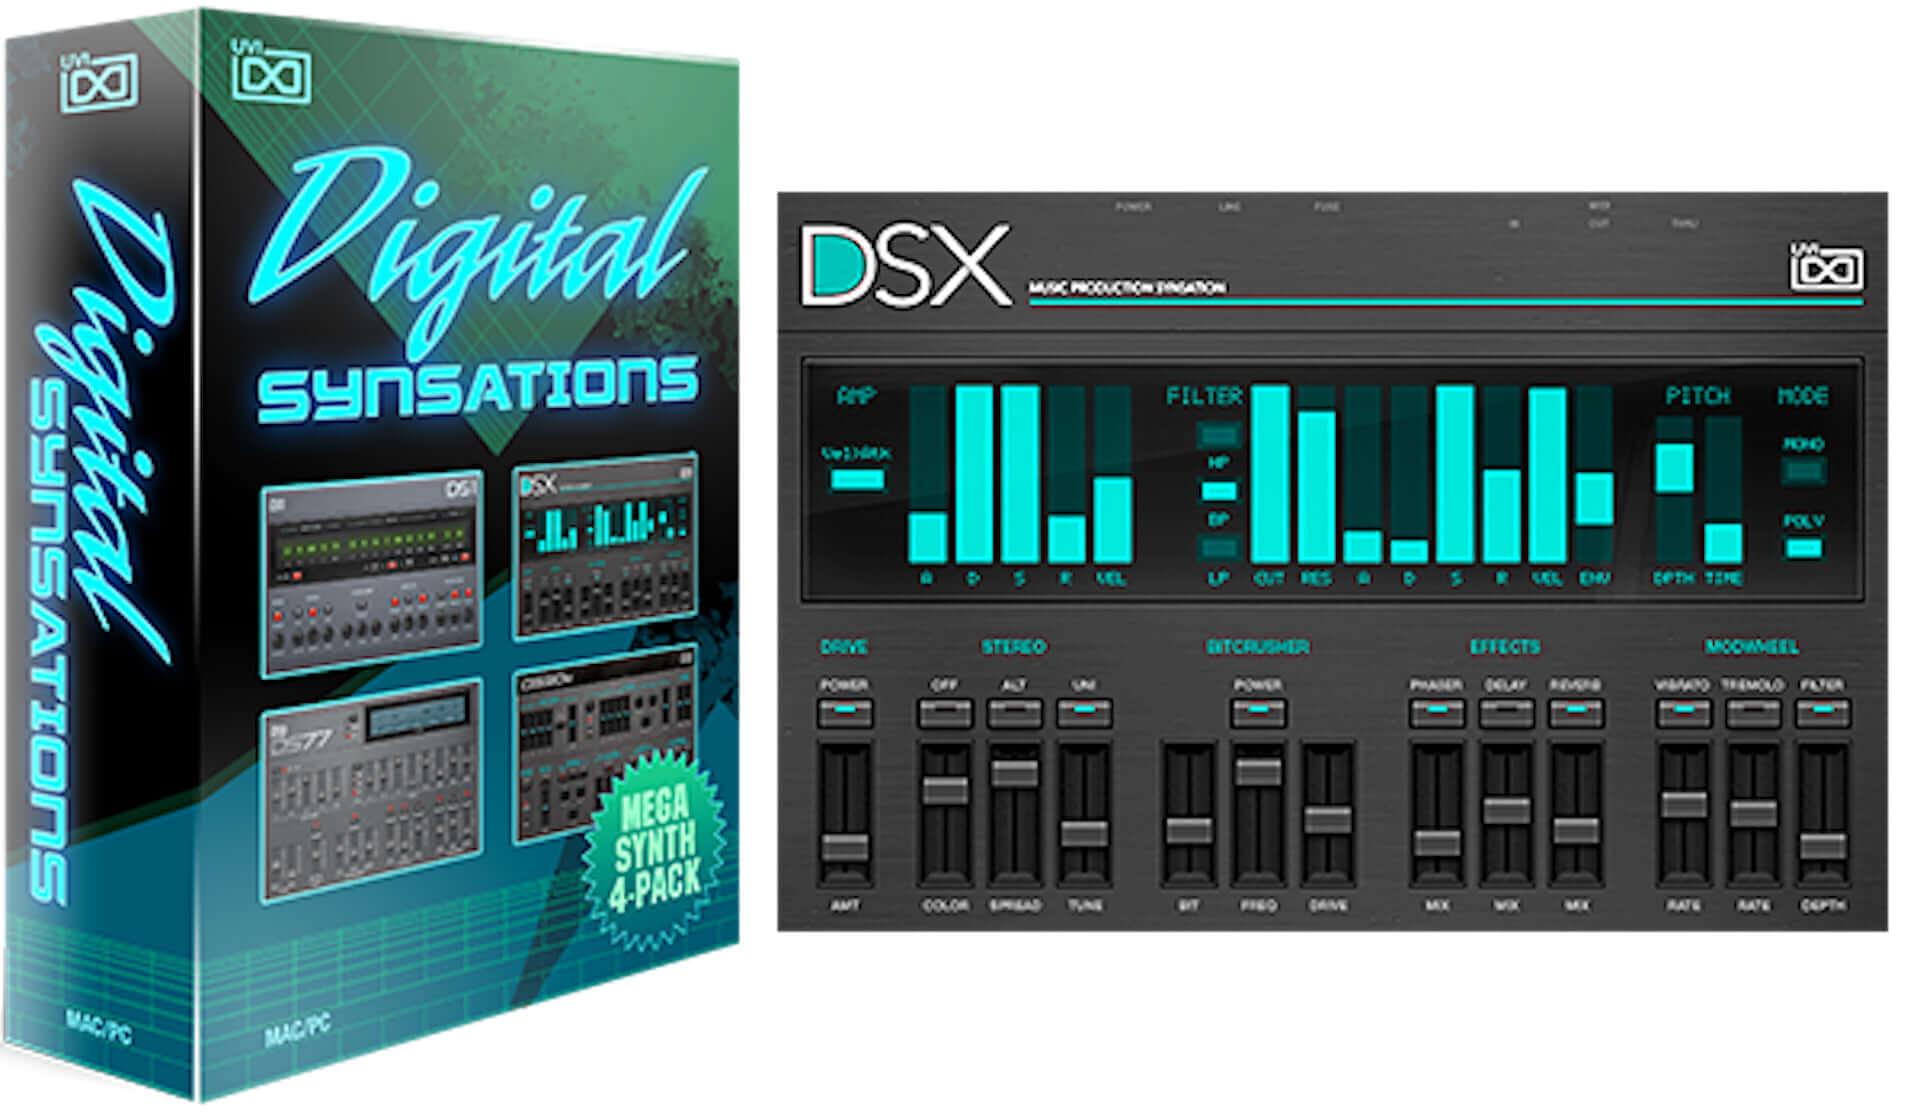 Studiologic製品購入でUVI『Digital Synsations』もプレゼント!期間限定キャンペーンが開始 music200402_studiologic_1-1920x1114